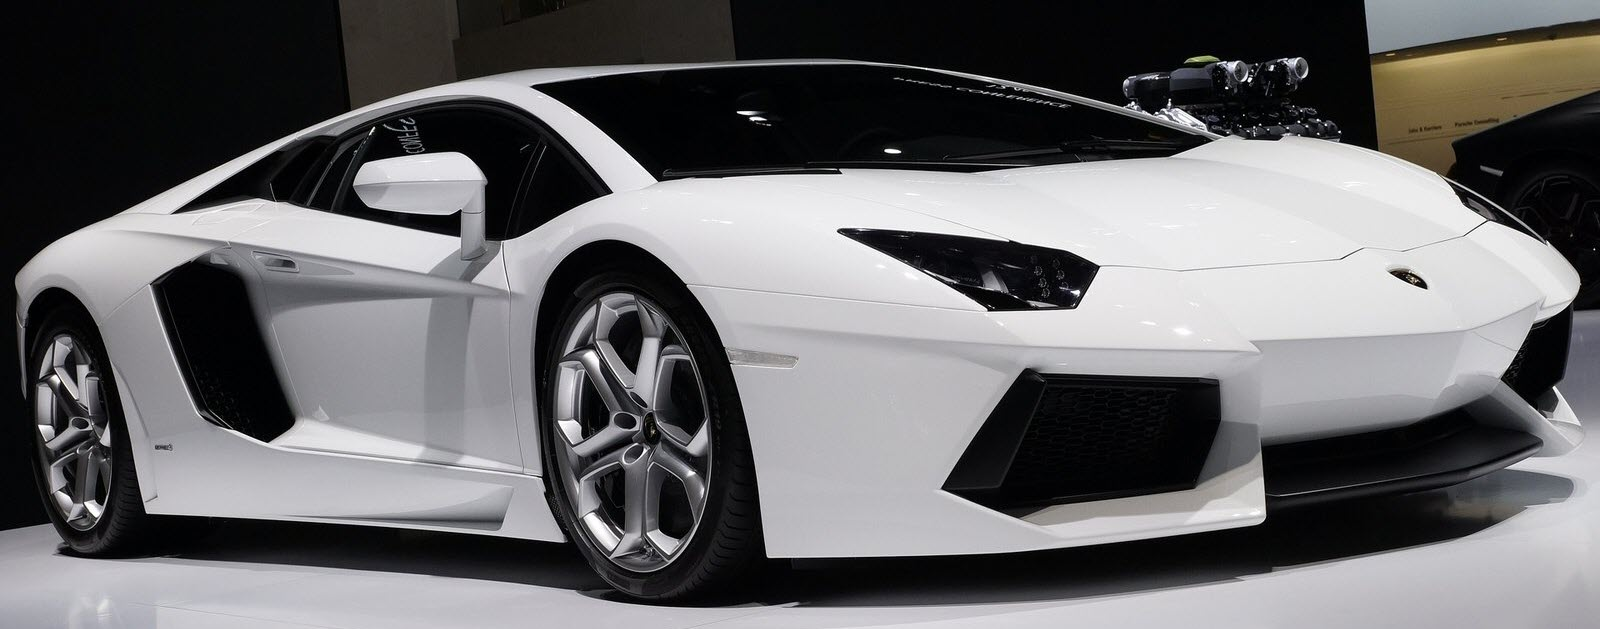 Superieur ... Lamborghini Aventador ...